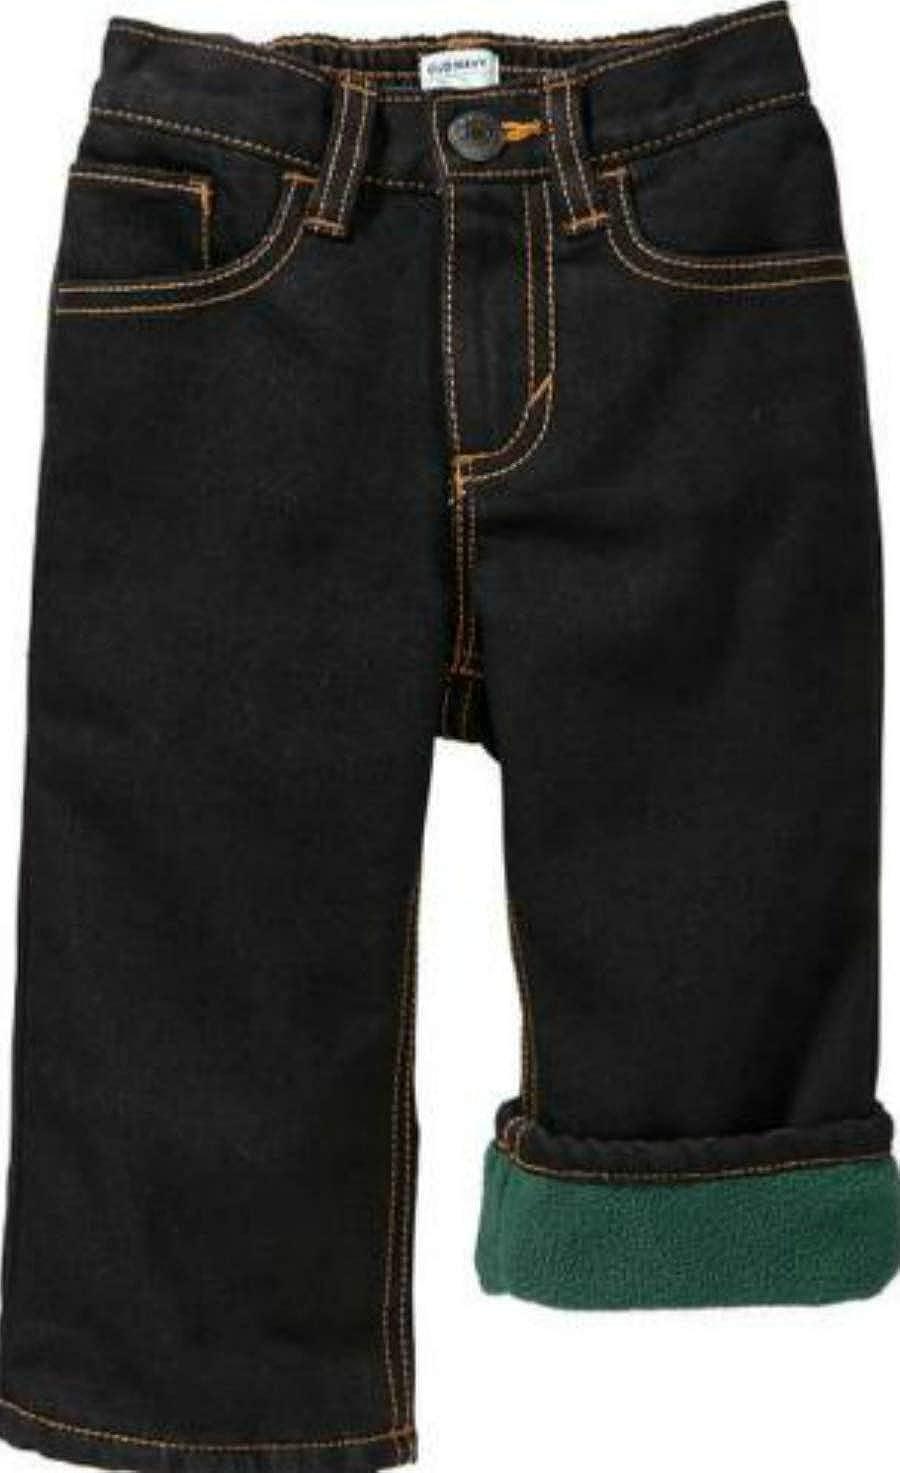 Old Navy Boys Fleece Lined Jeans Sz 18M-24M Black